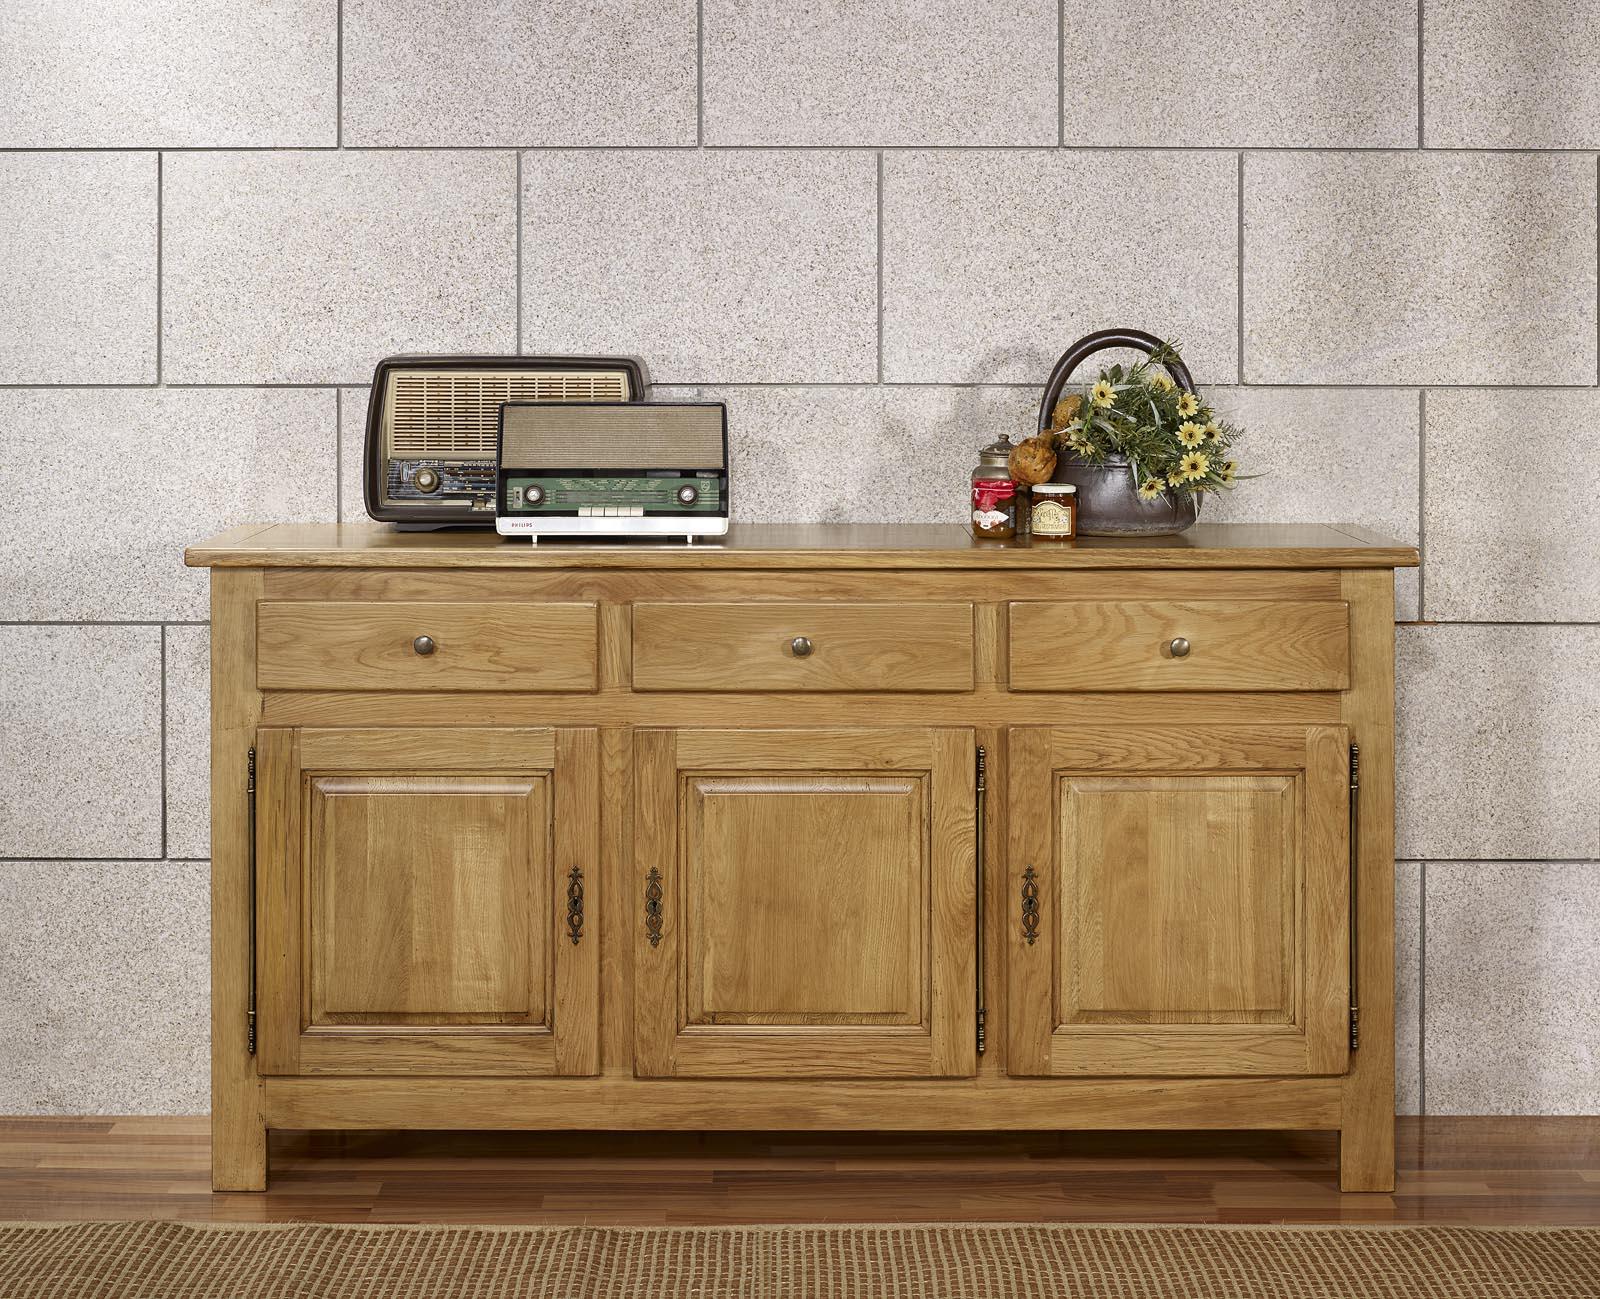 buffet 3 portes 3 tiroirs en ch ne massif de style campagnard 1 seul disponible meuble en ch ne. Black Bedroom Furniture Sets. Home Design Ideas